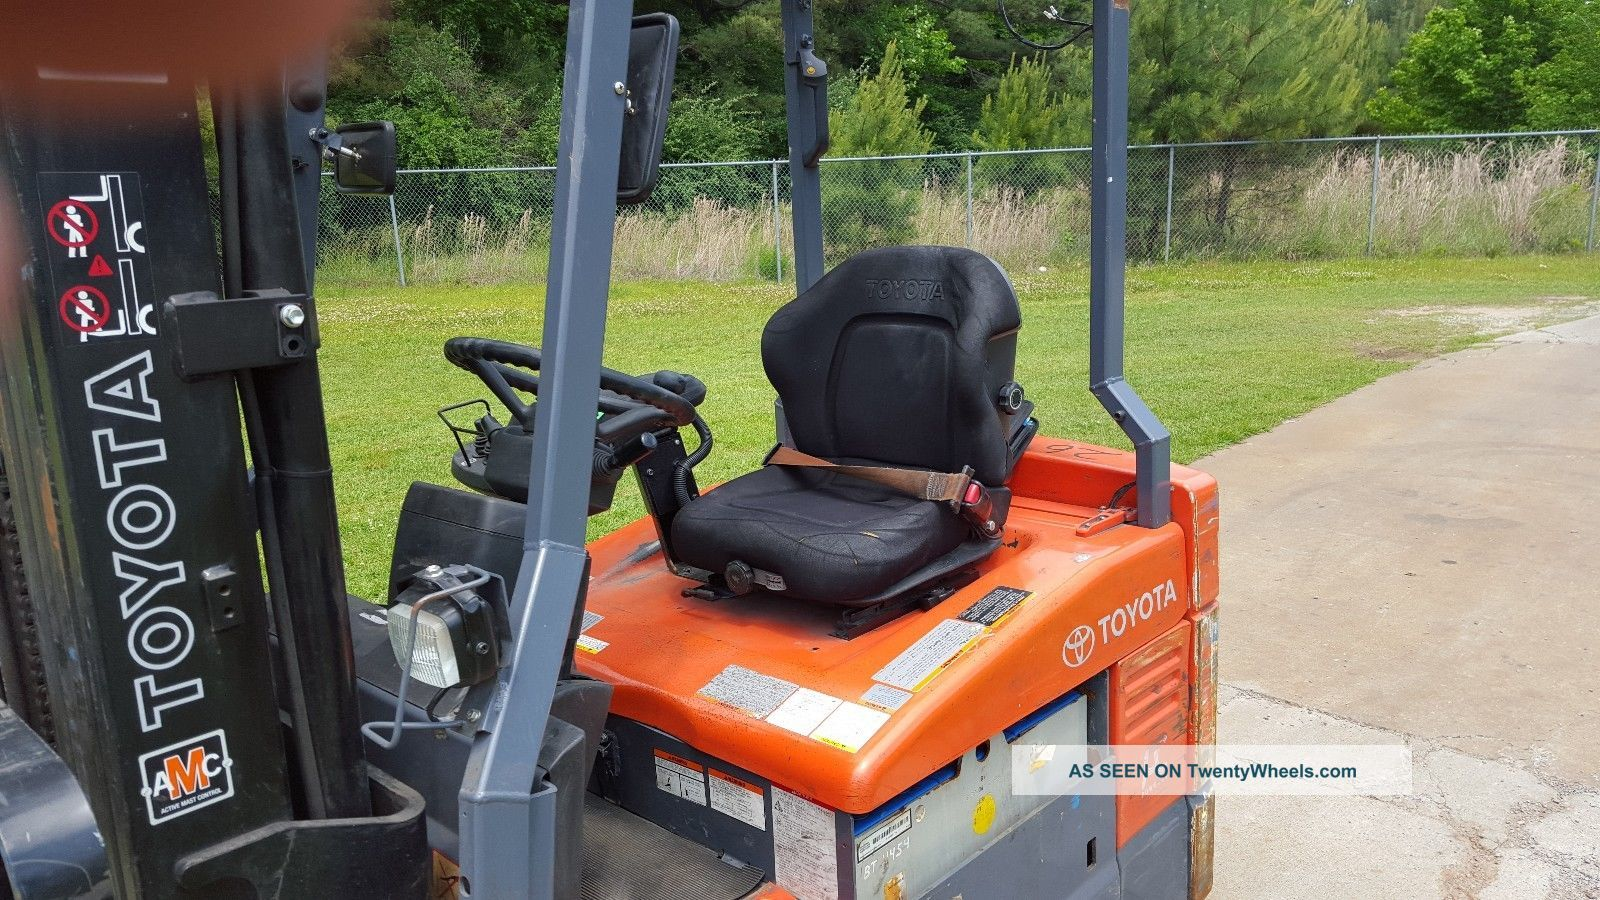 Toyota Forklift Shift Lever Switch : Toyota fbeu forklift w quot quad mast side shift